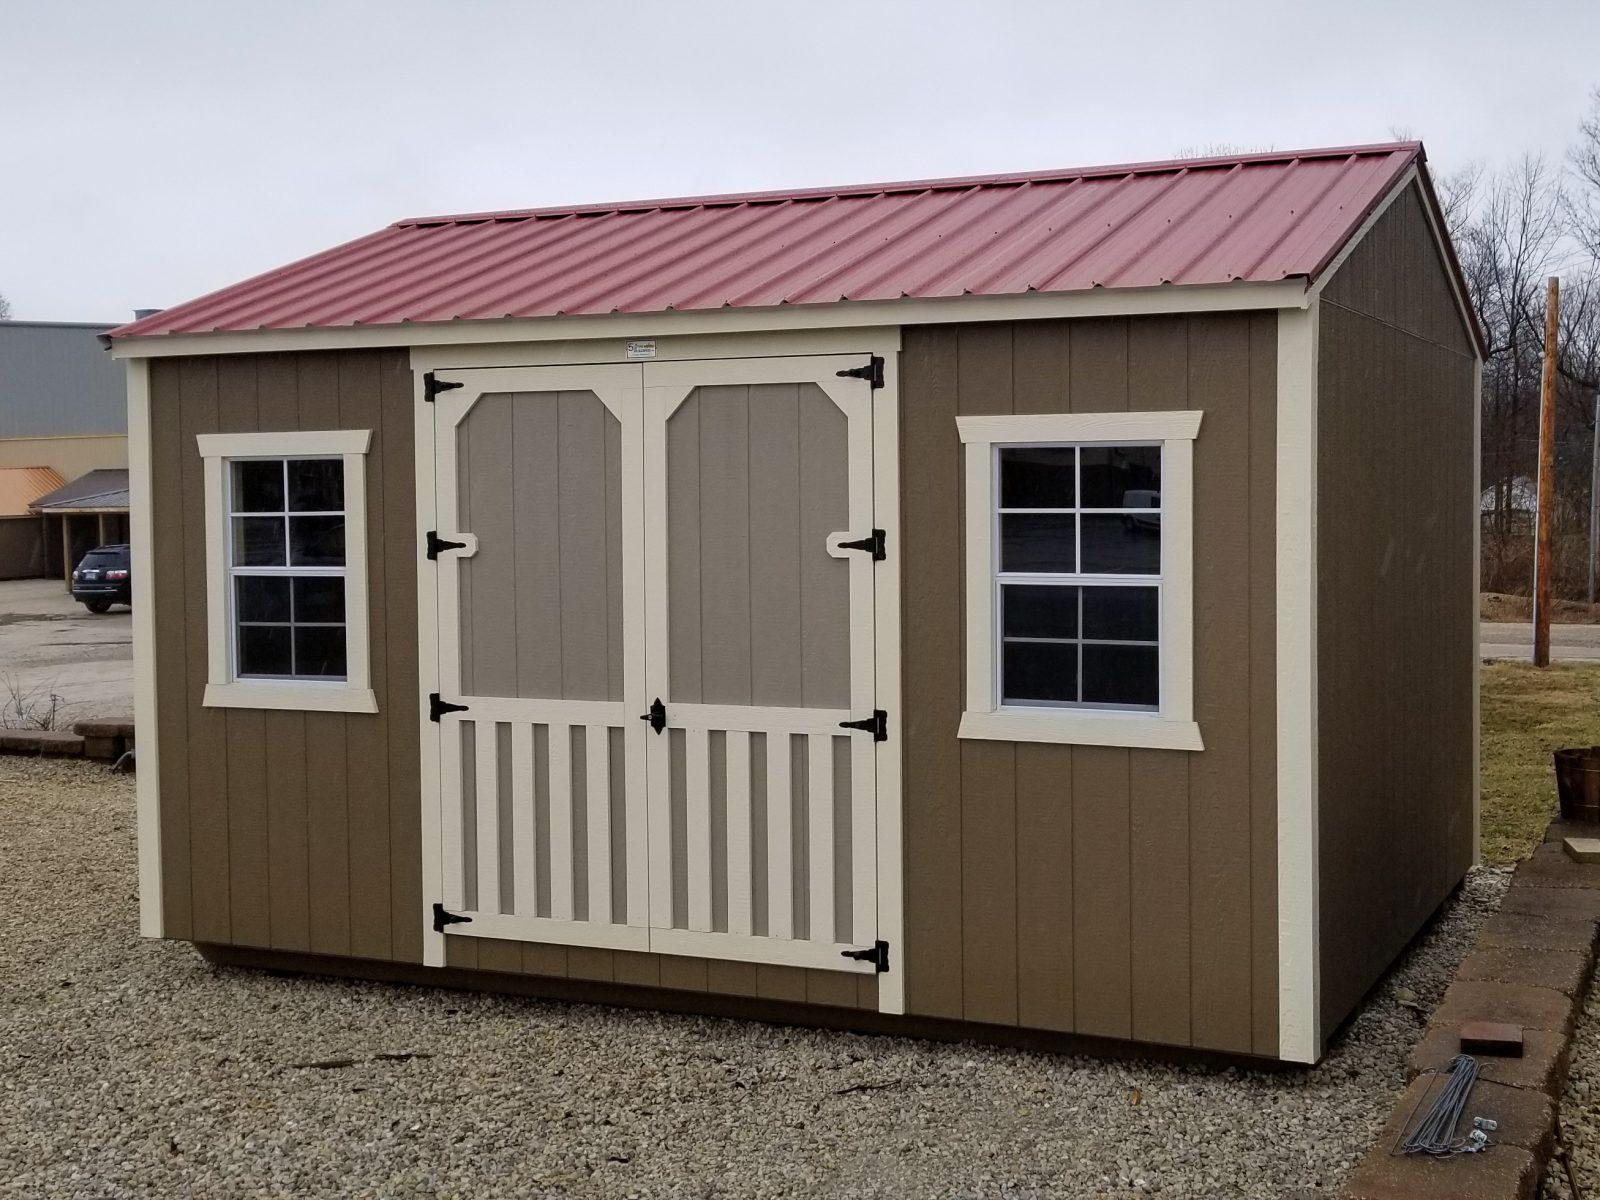 wood shed for sale near saint louis